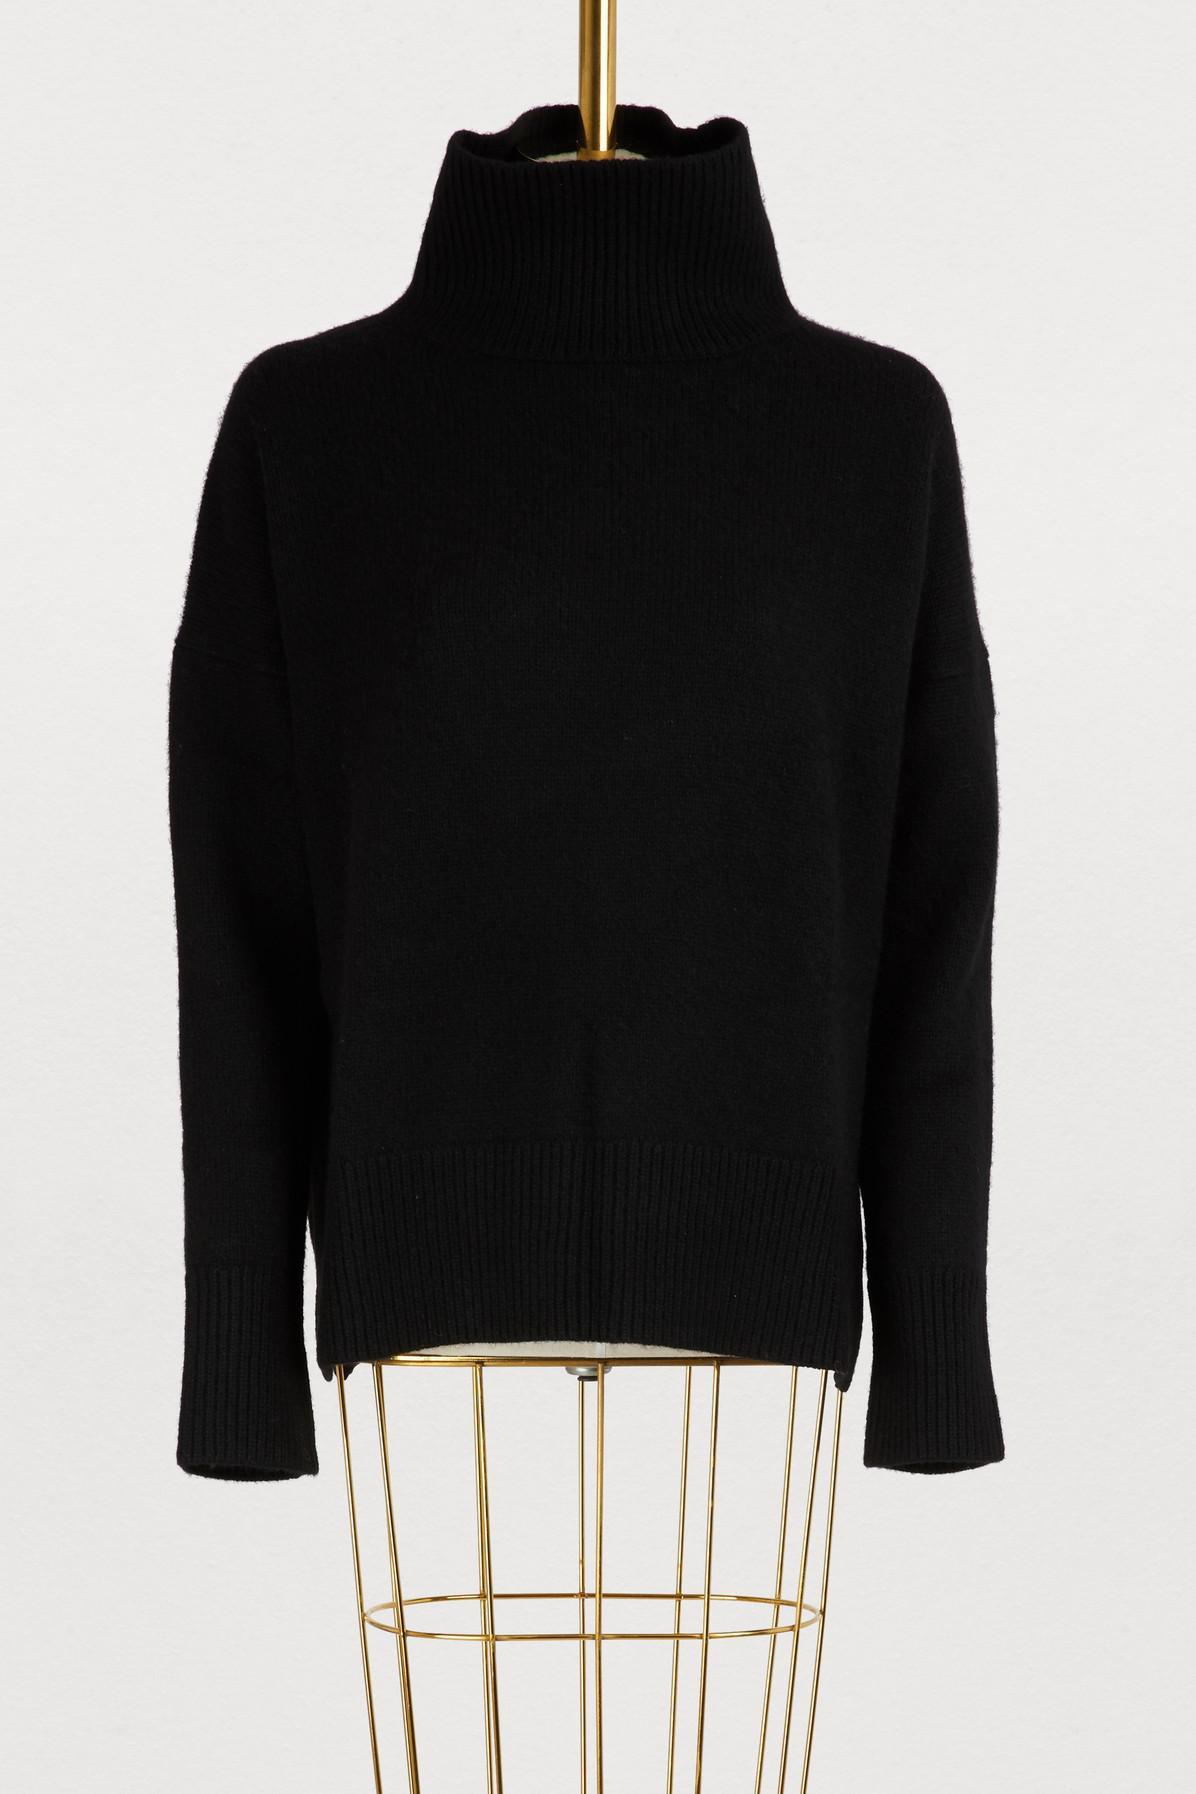 c200a1b5b7 Vanessa Bruno Jafet Turtleneck Sweater in Black - Lyst